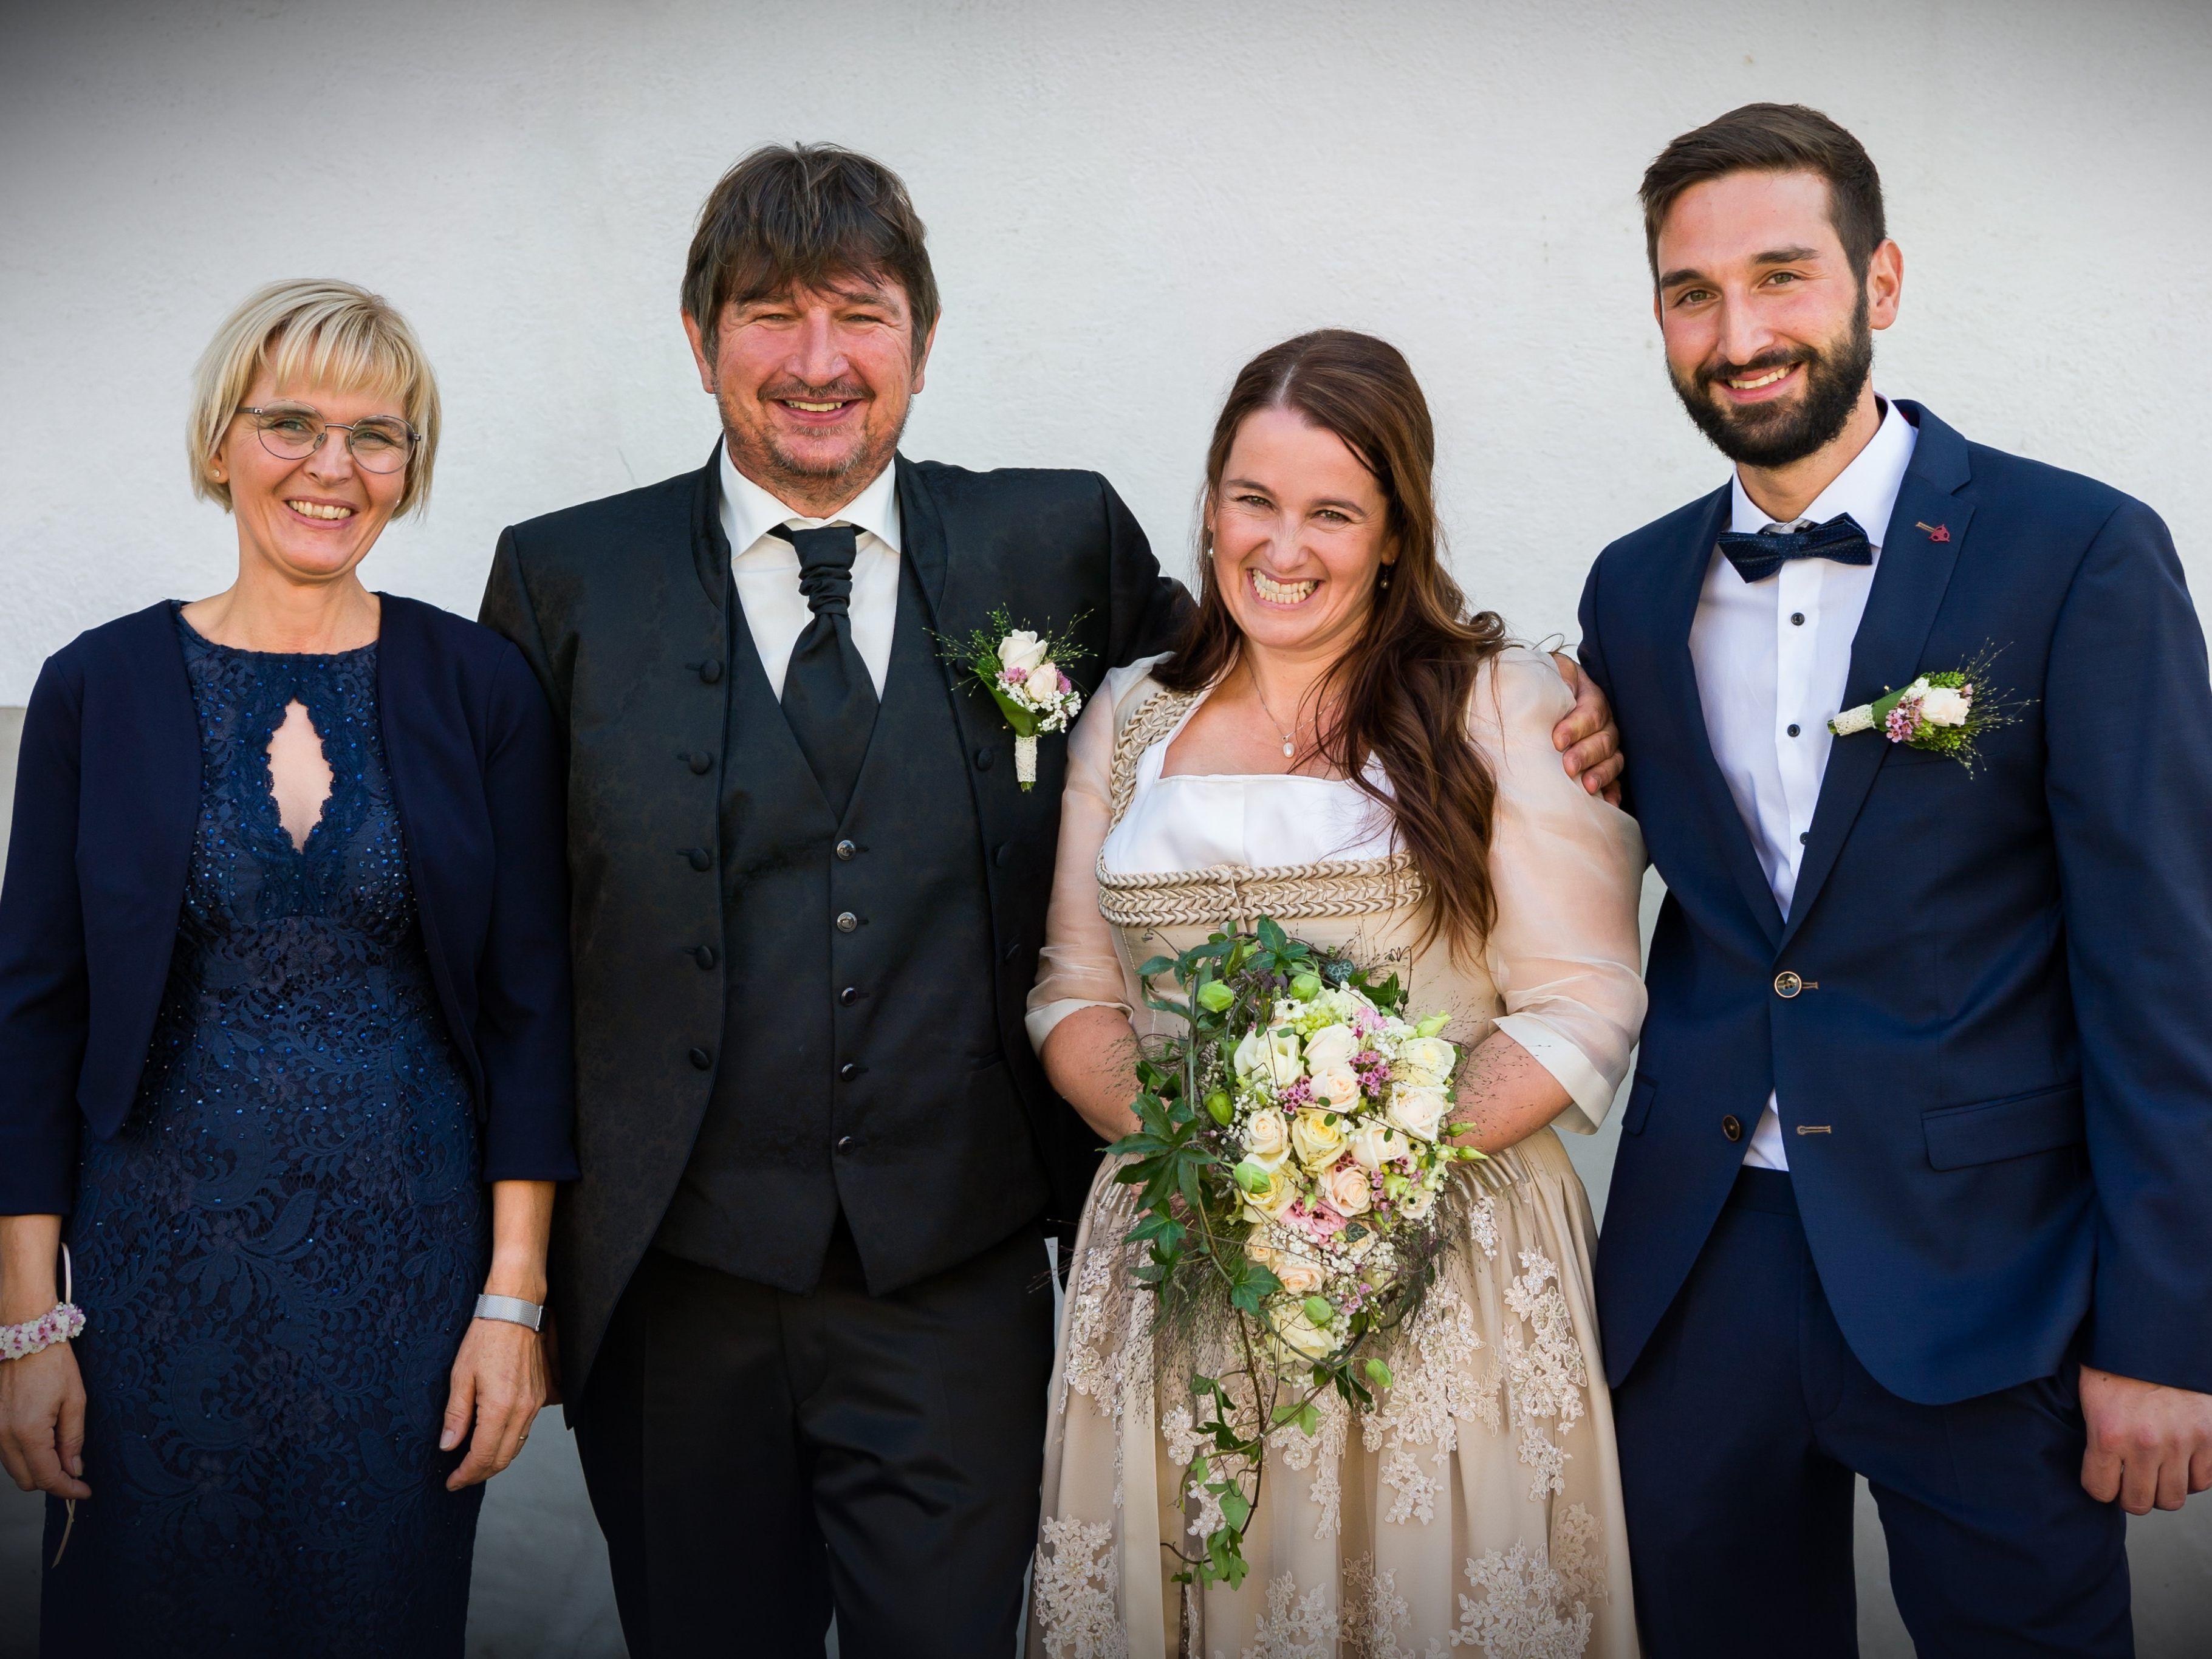 single sucht single in Rankweil - Partnersuche & Kontakte